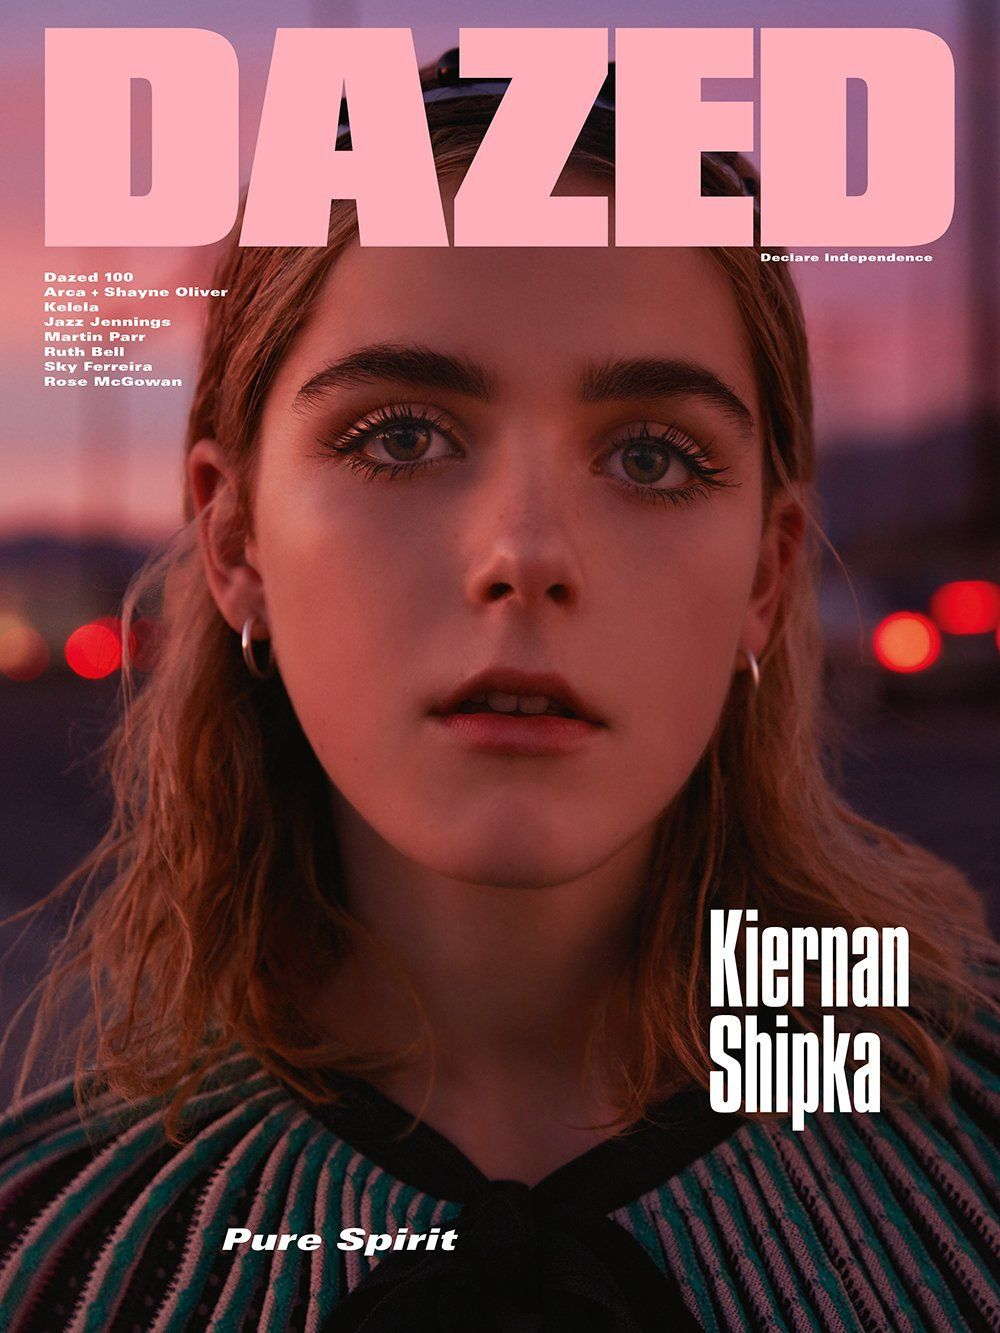 kiernan shipka for dazed magazine spring 2016